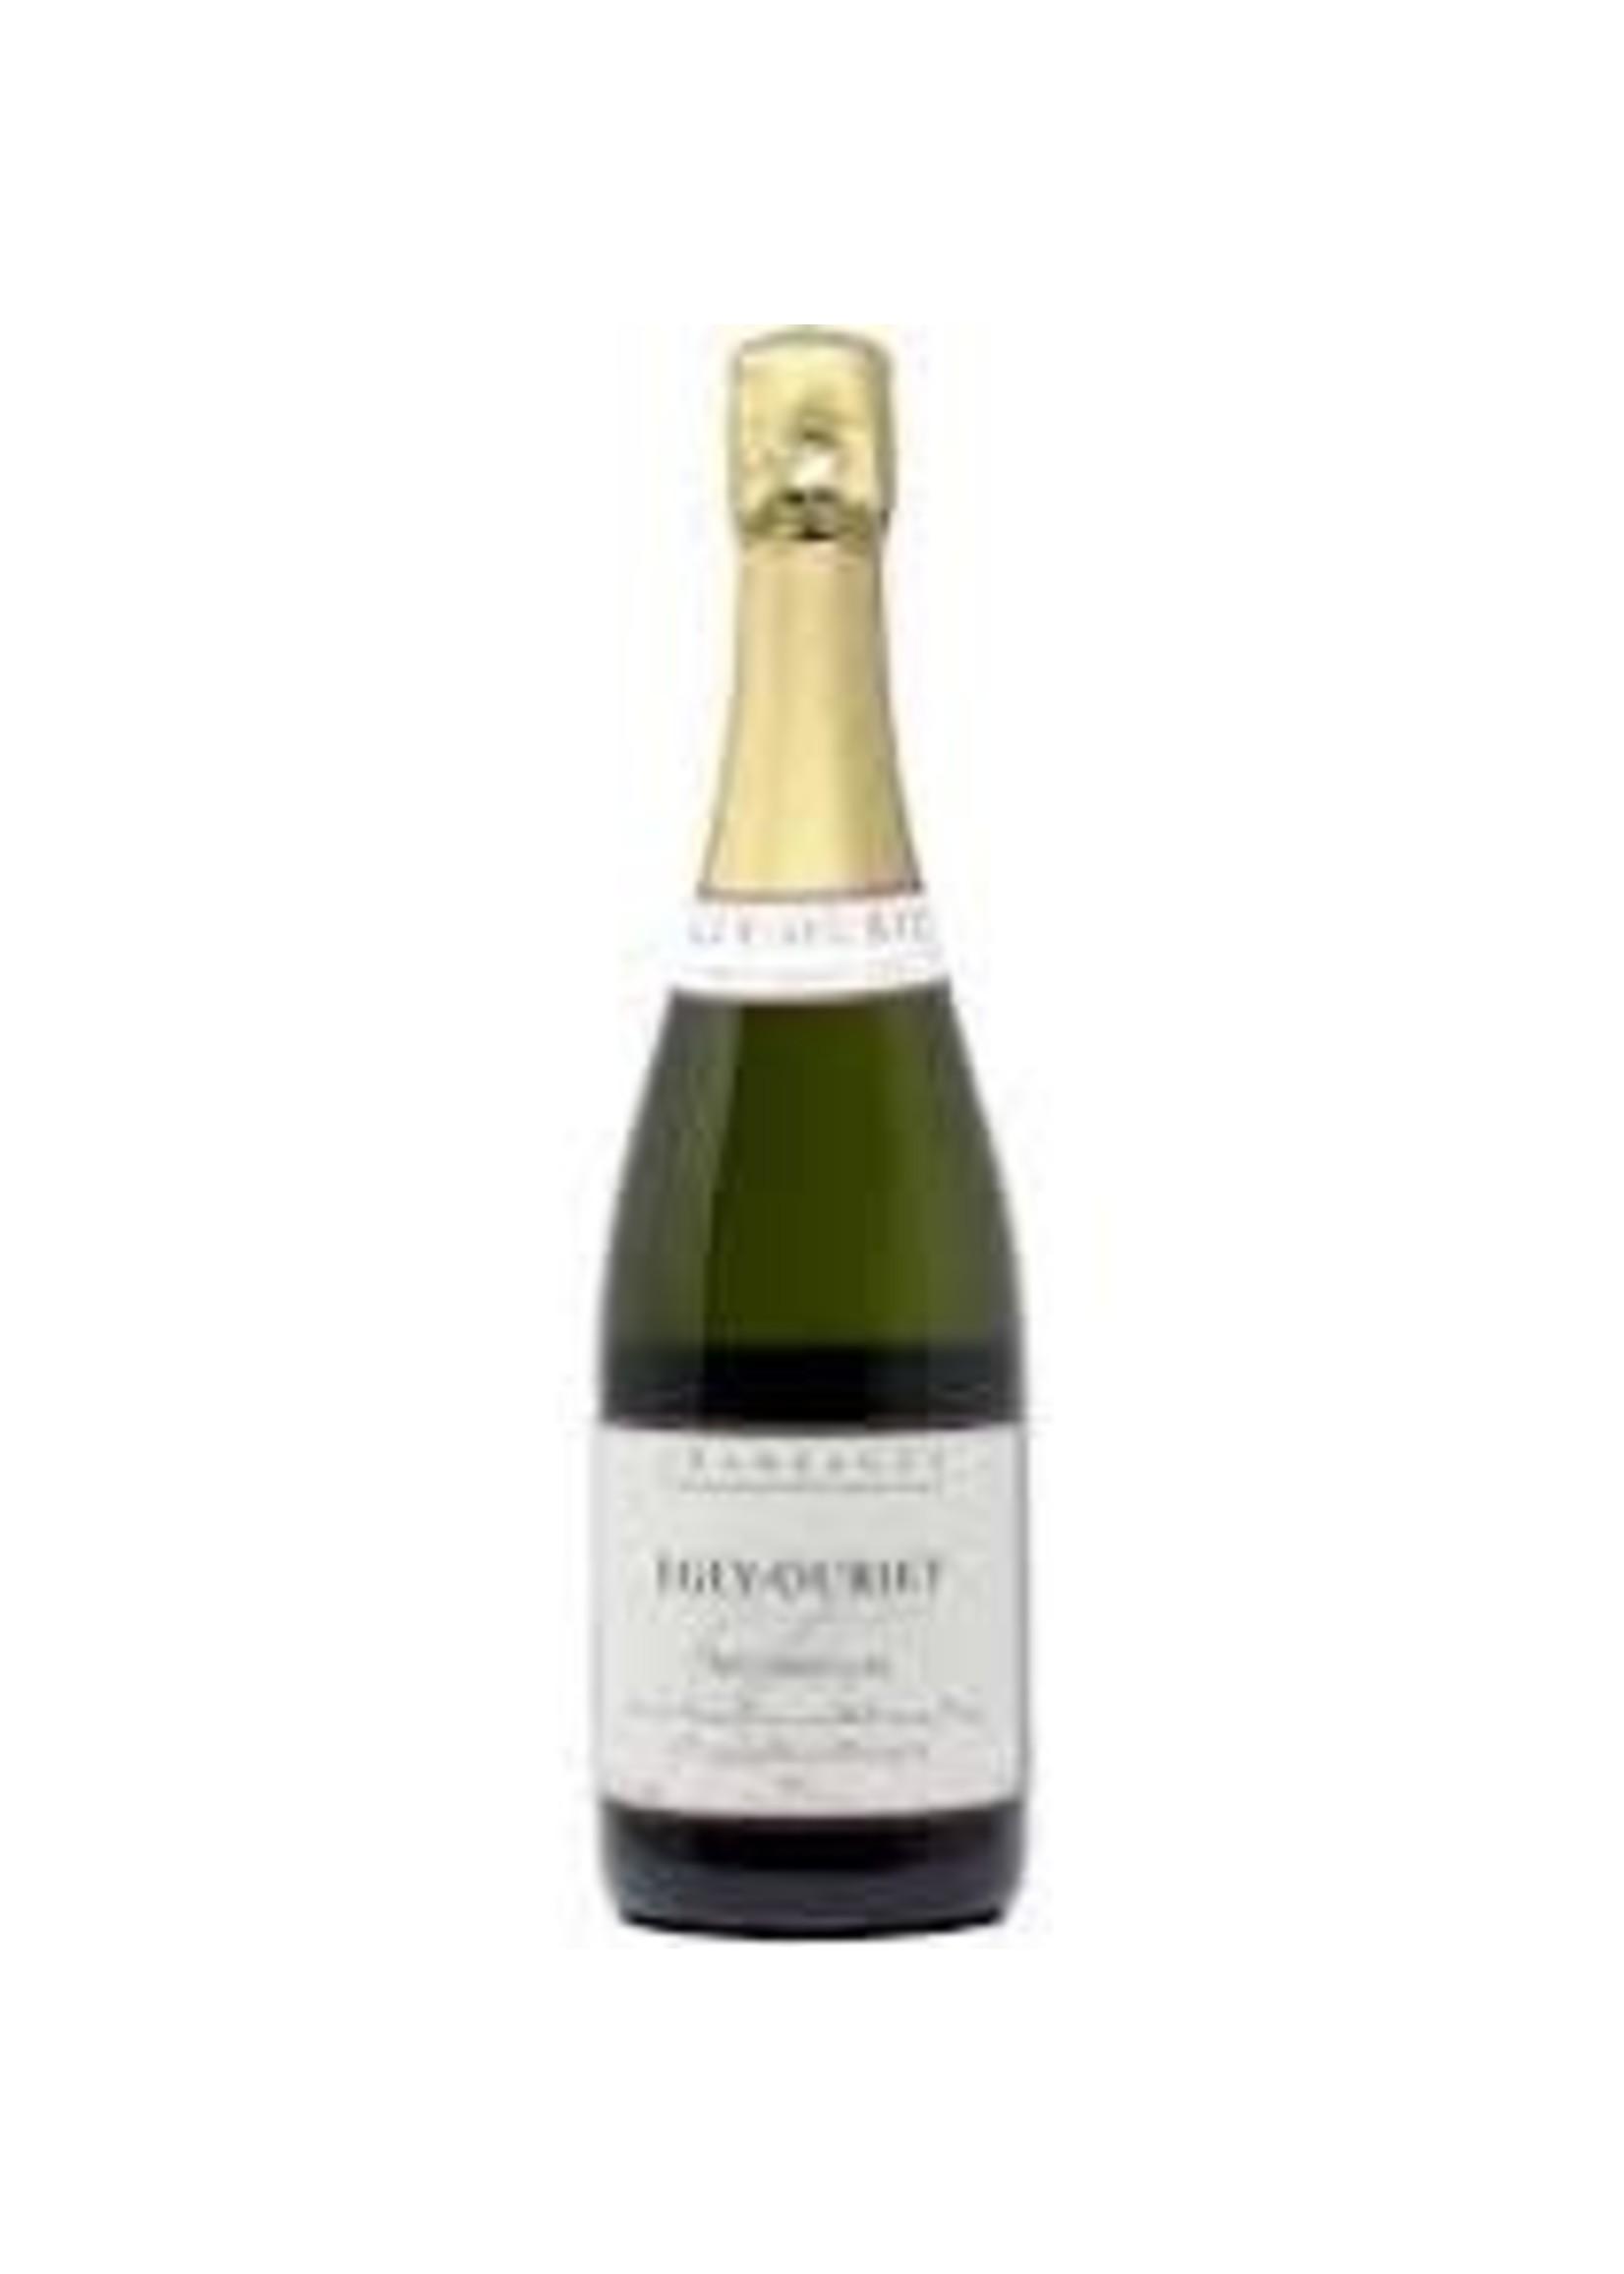 Egly Ouriet NV Champagne Brut Grand Cru 750ml